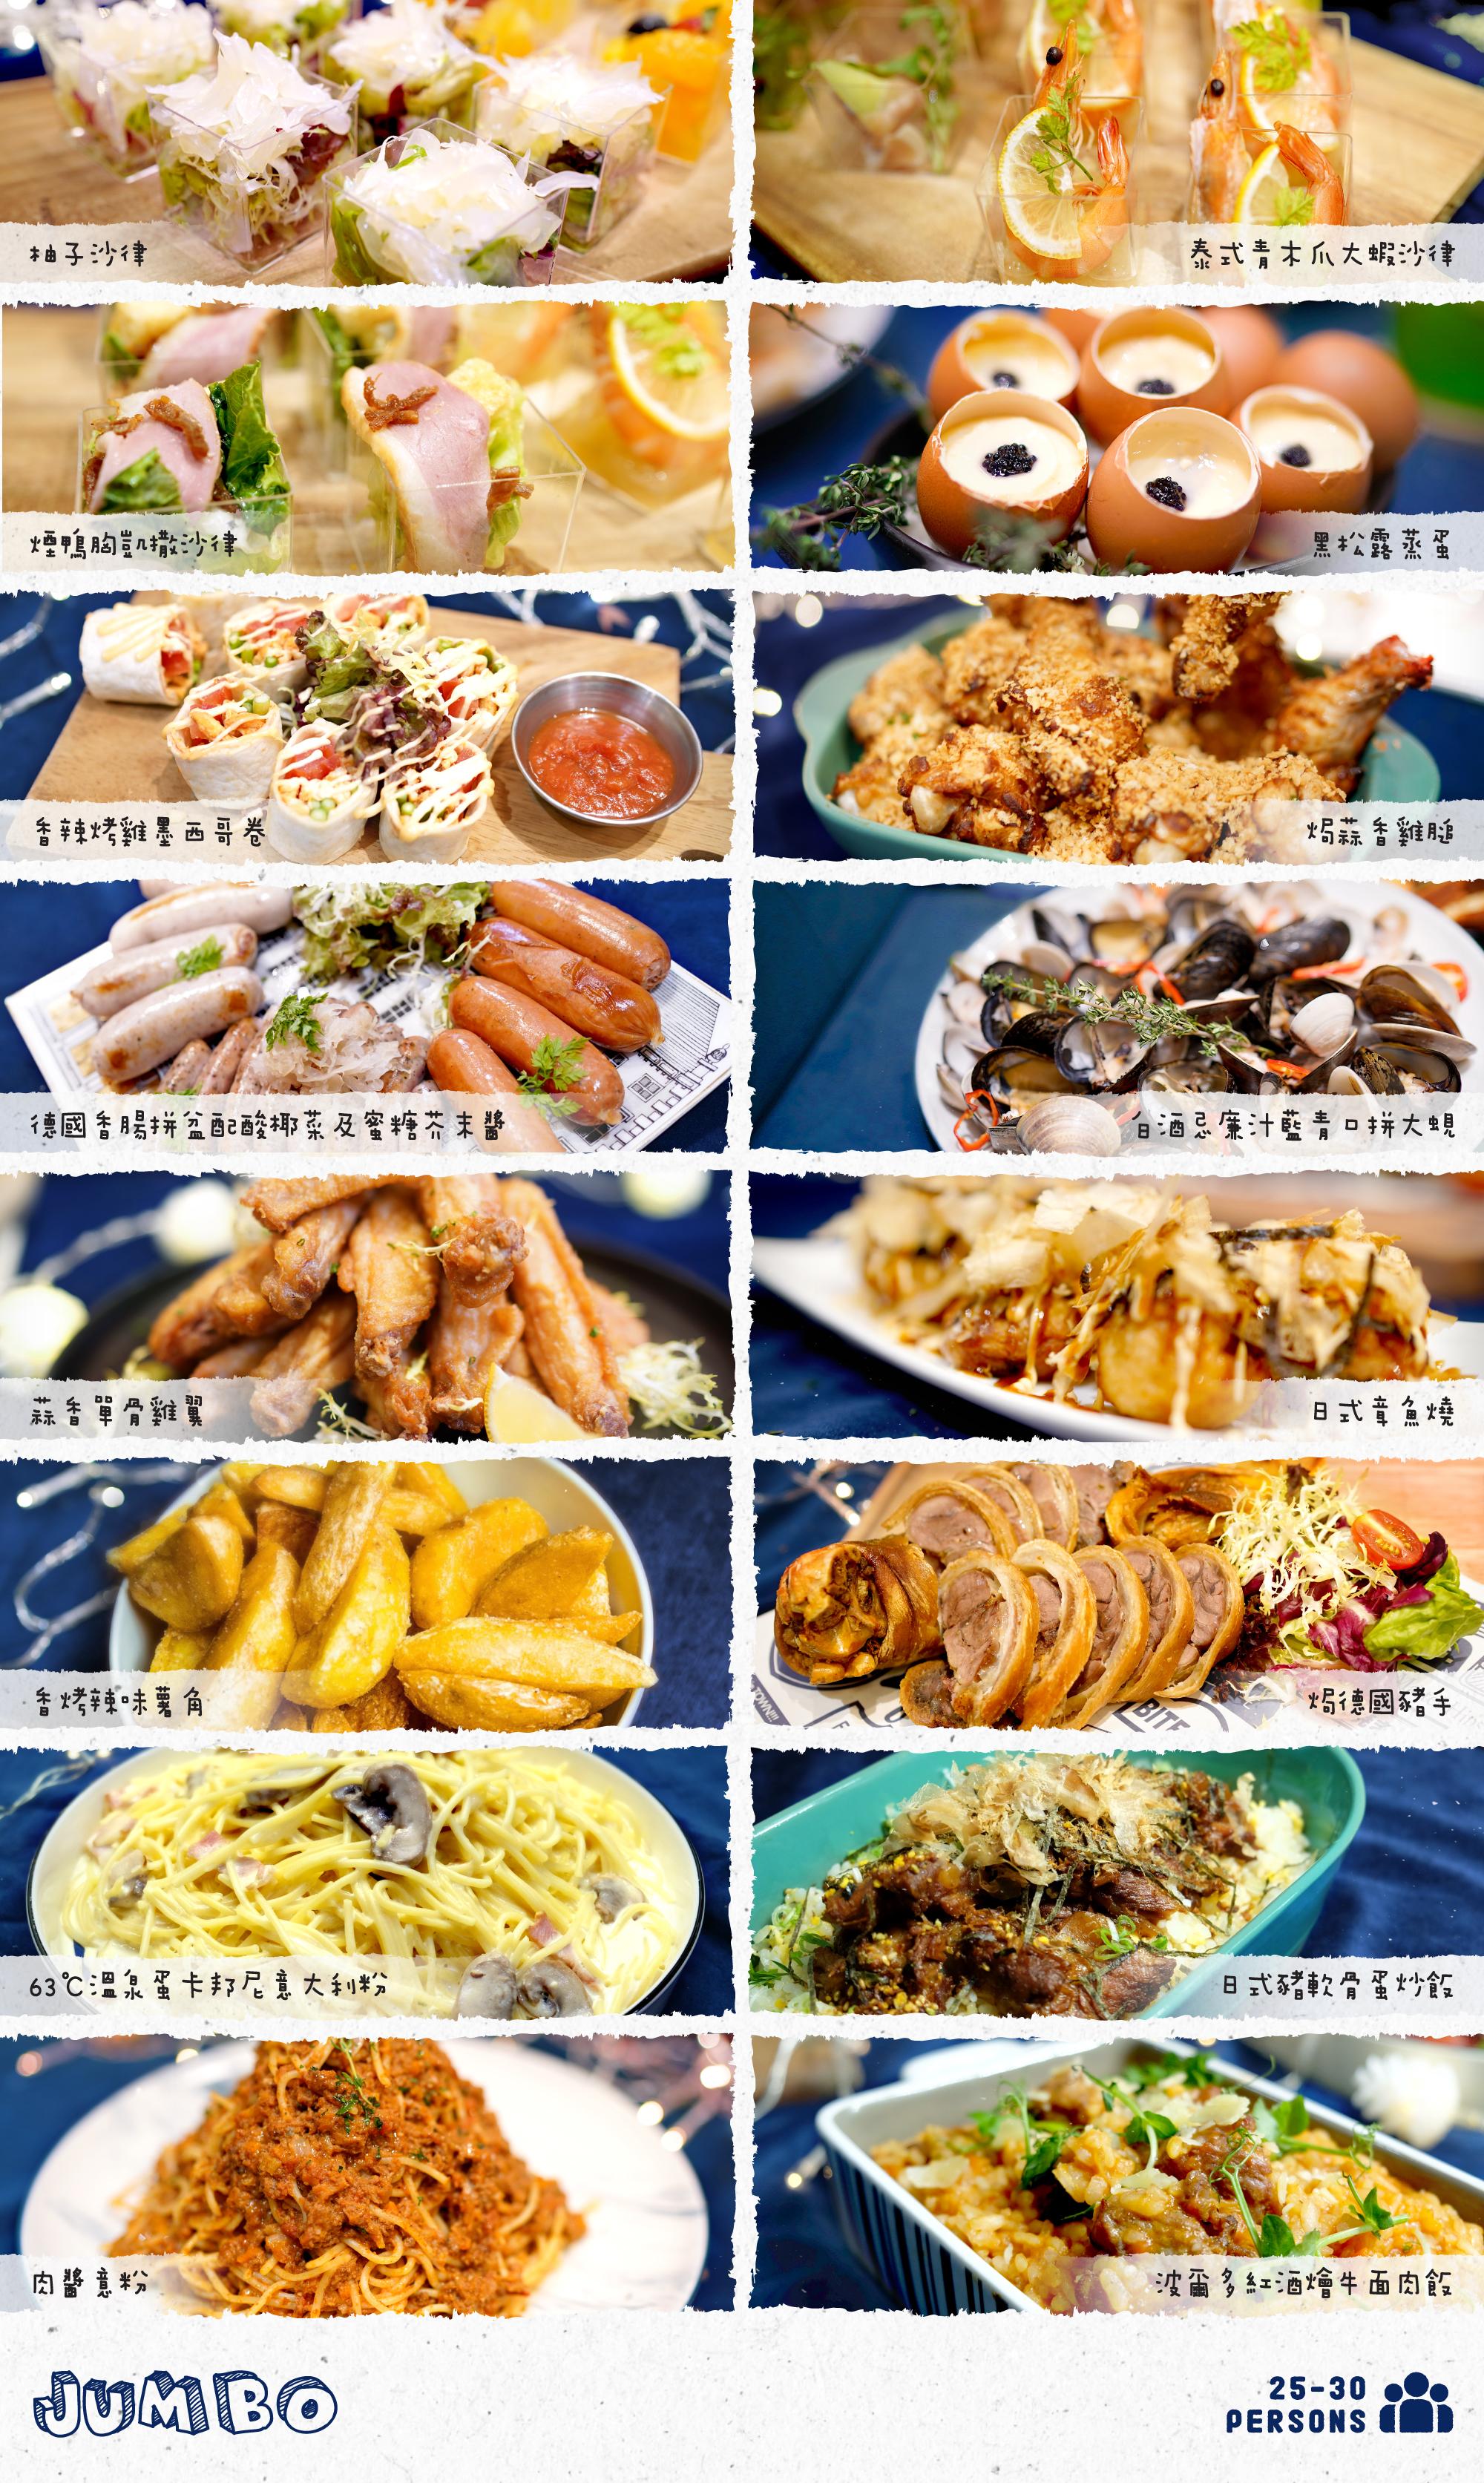 Kamadelivery推出的Jumbo Set 到會套餐食物份量適合25-30人到會派對享用